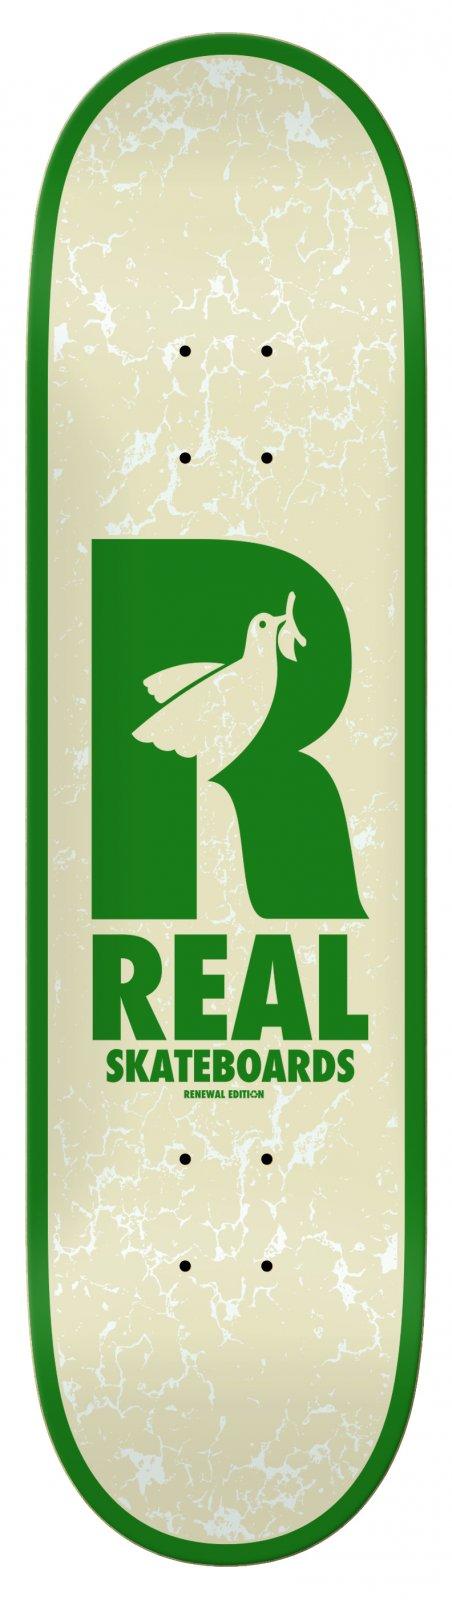 Real Doves Renewal PP 8.5 x 31.8